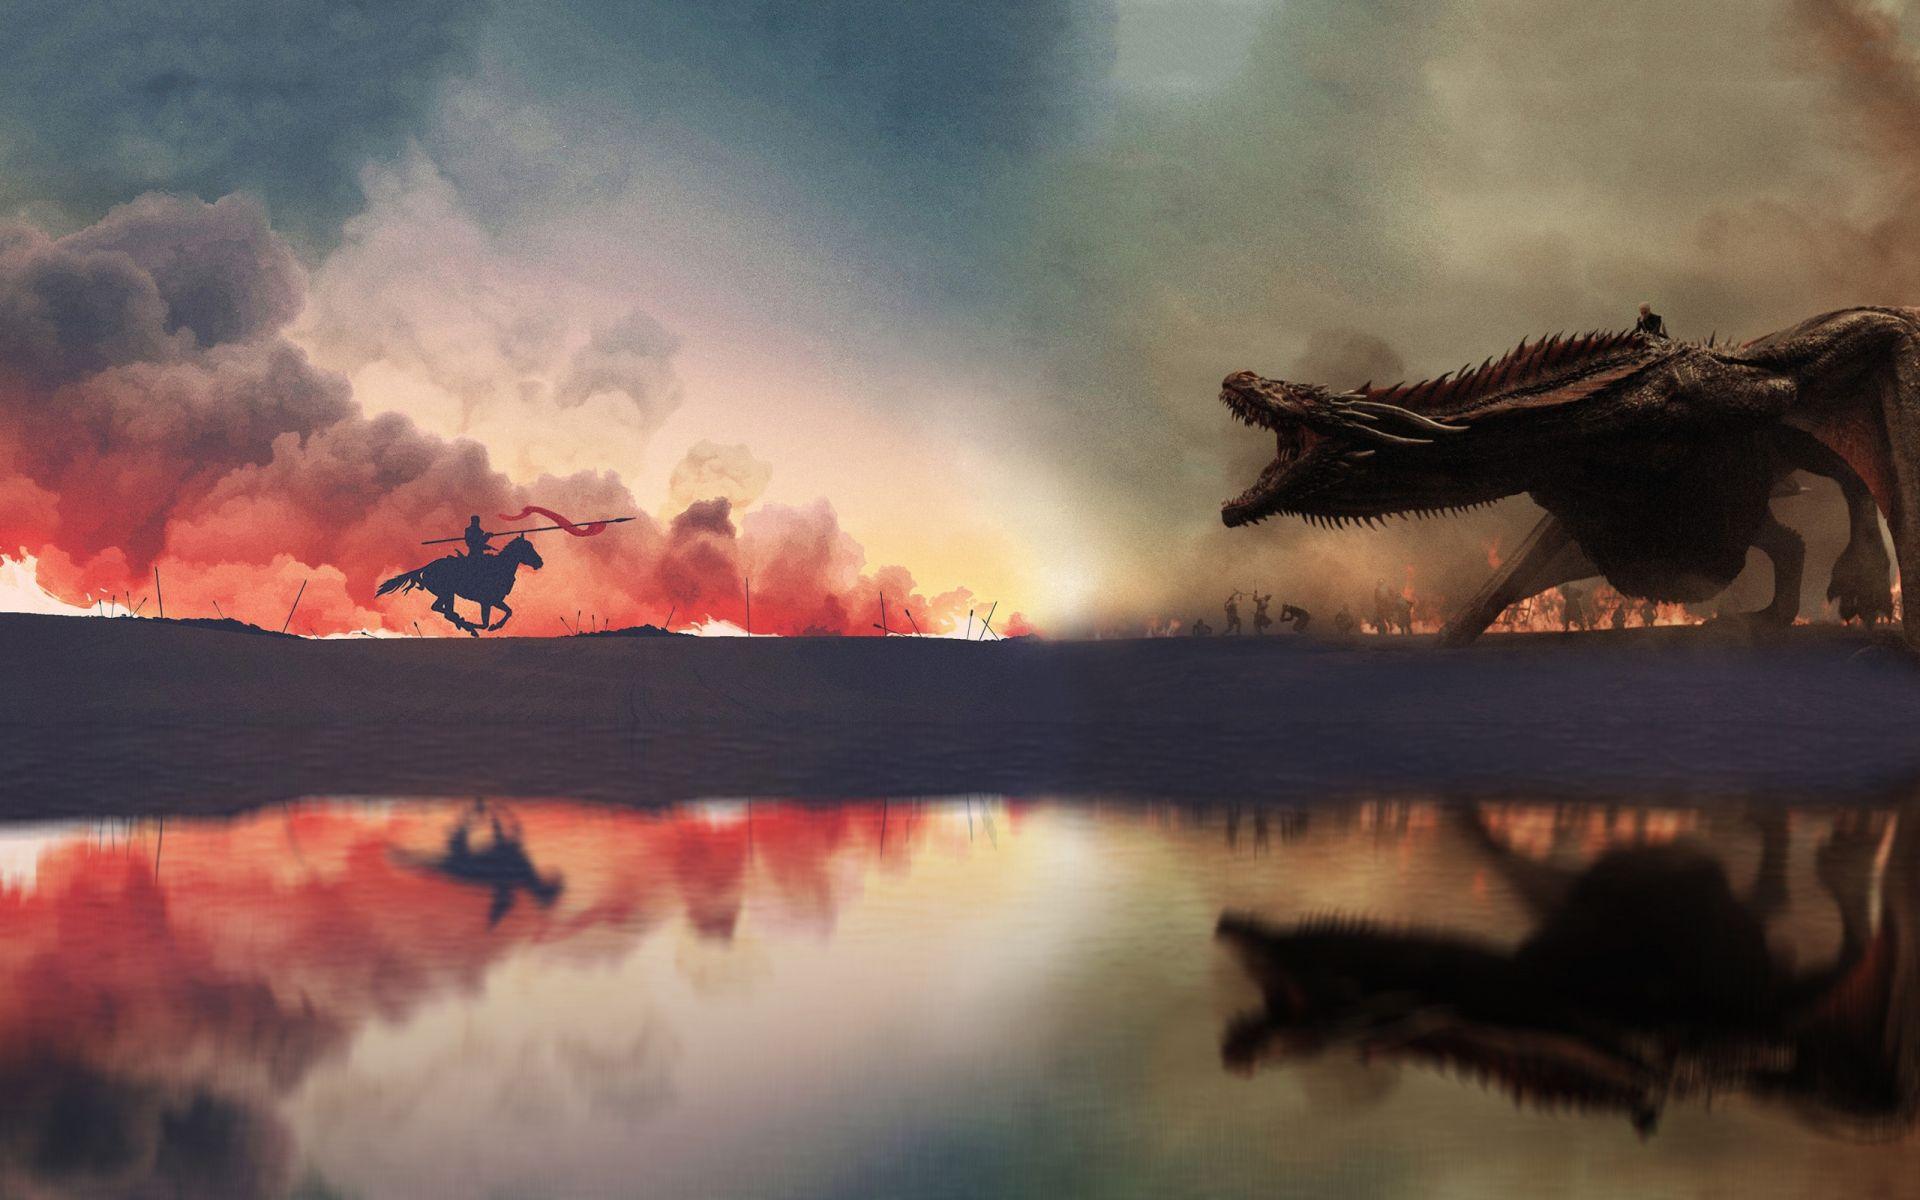 Game of Thrones Horseman and Dragon Minimalist art